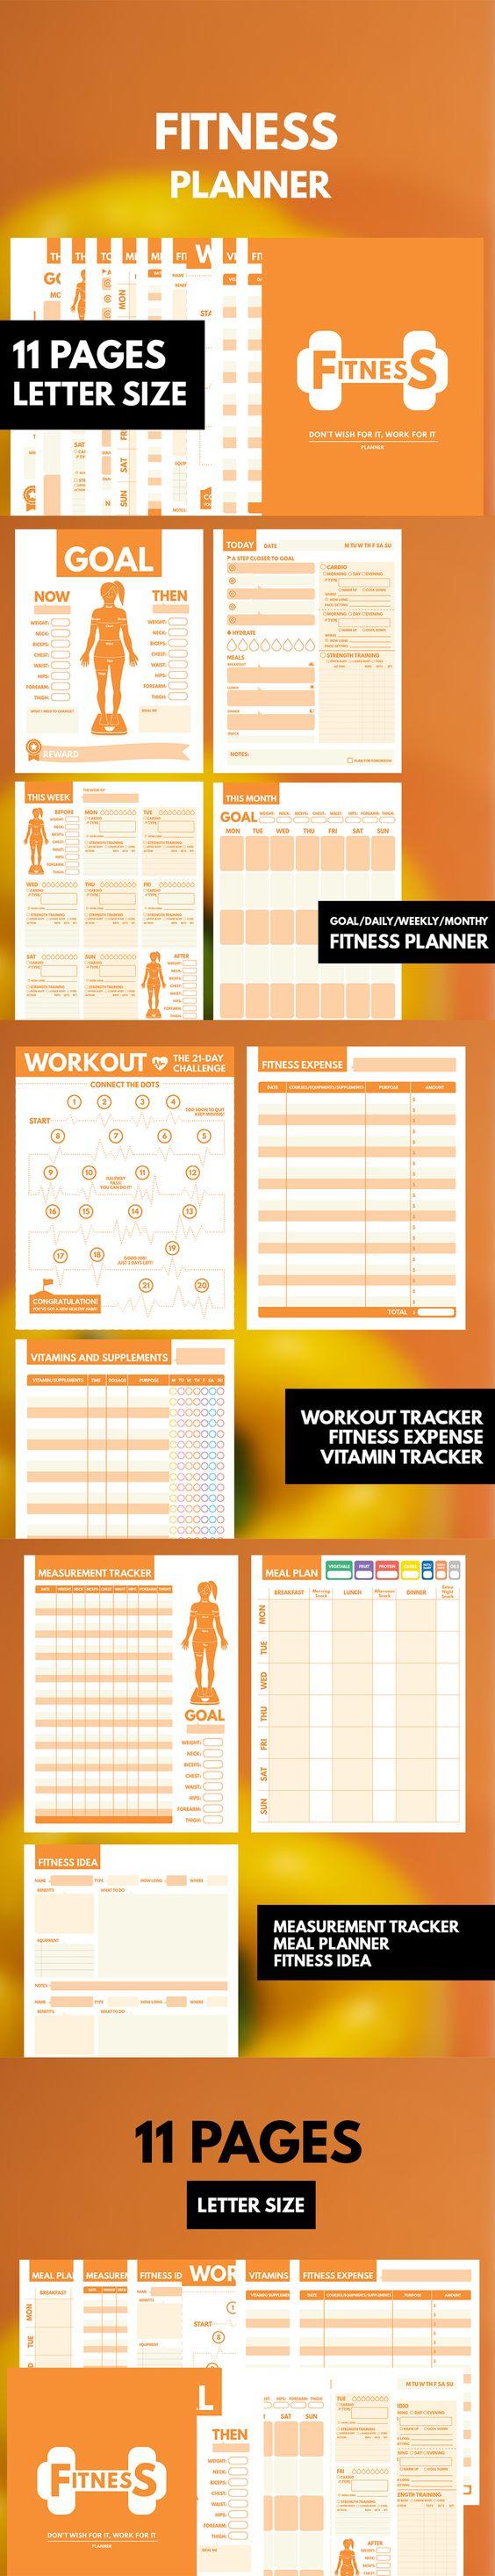 ufc fit workout tracker pdf